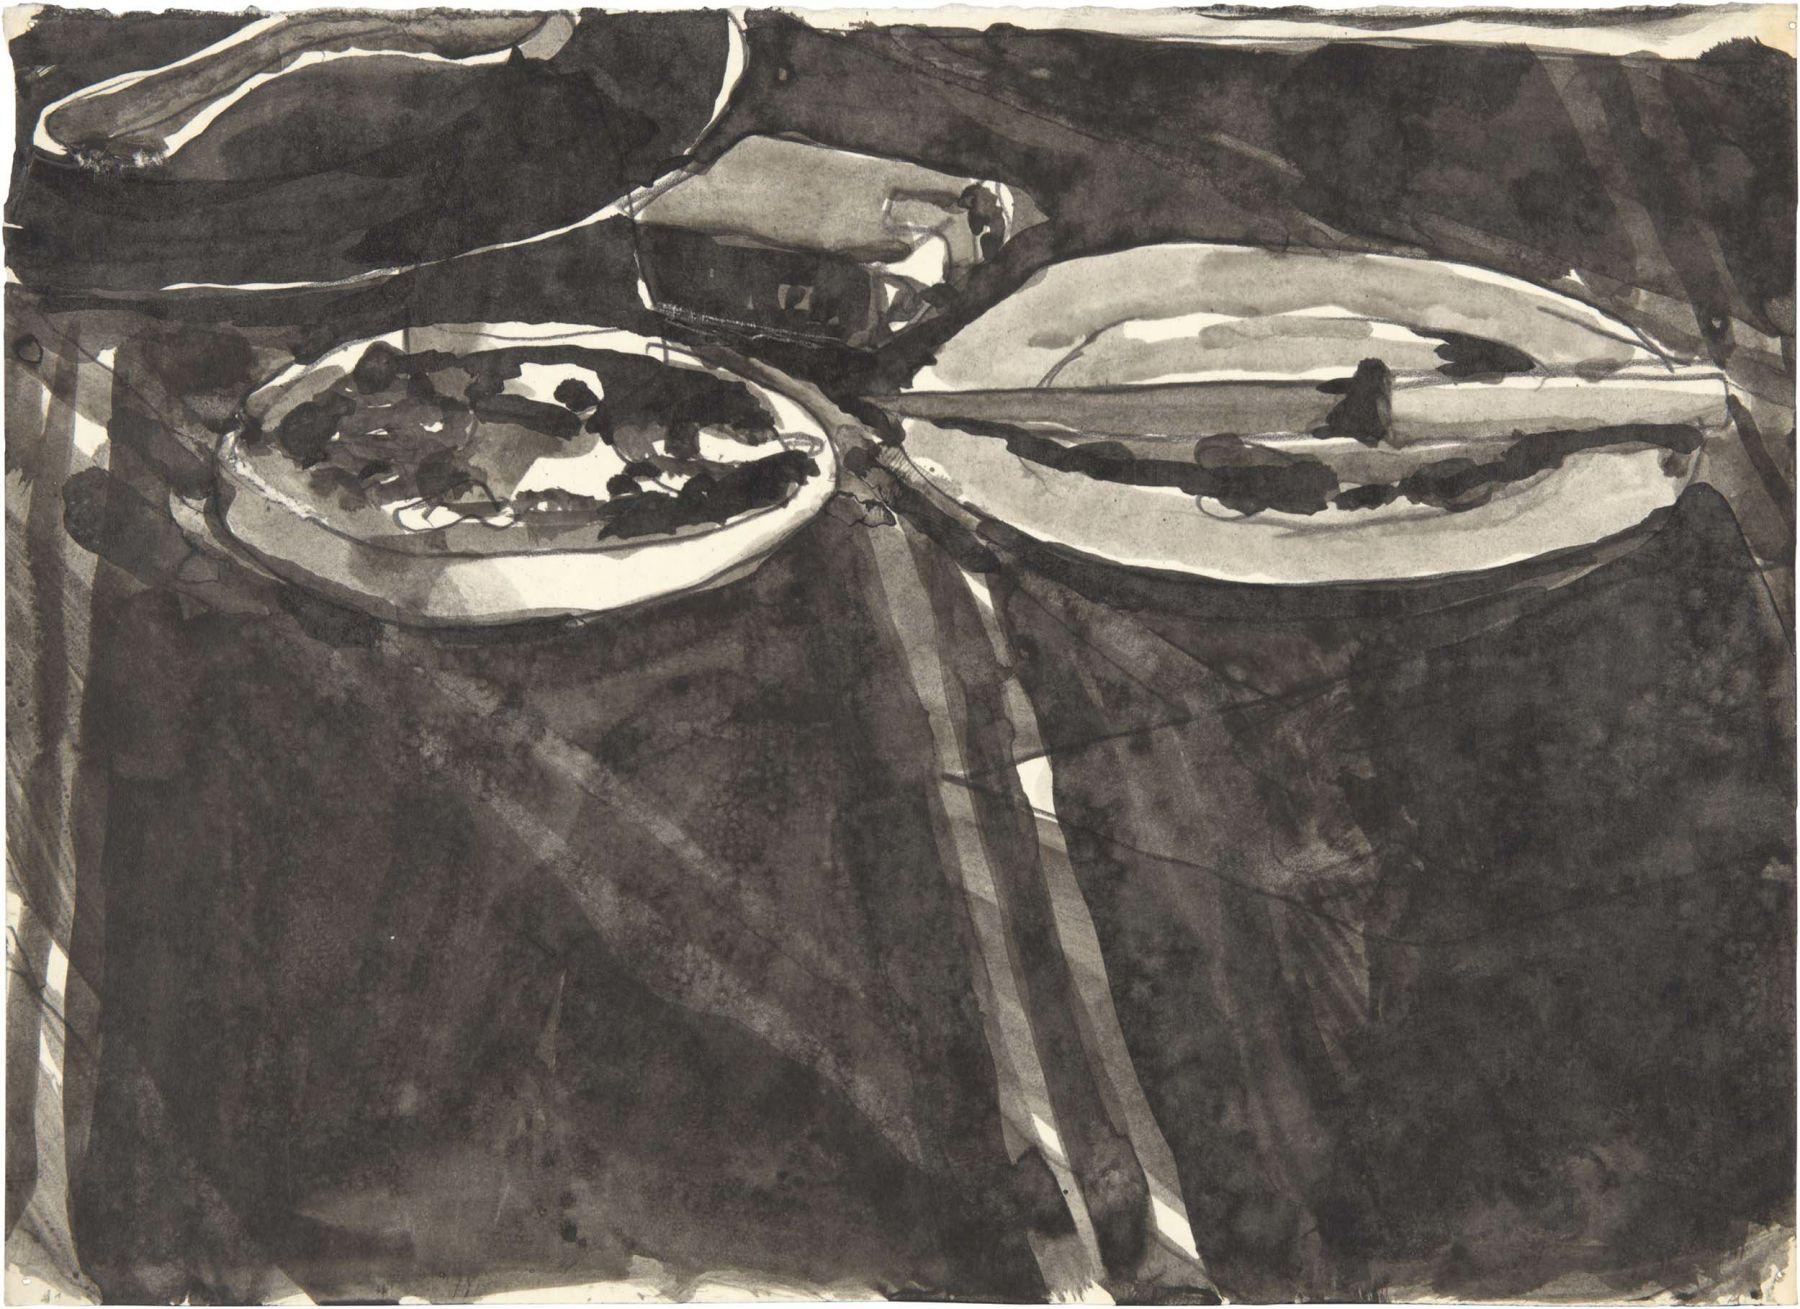 Untitled (CR no. 3438), c. 1964